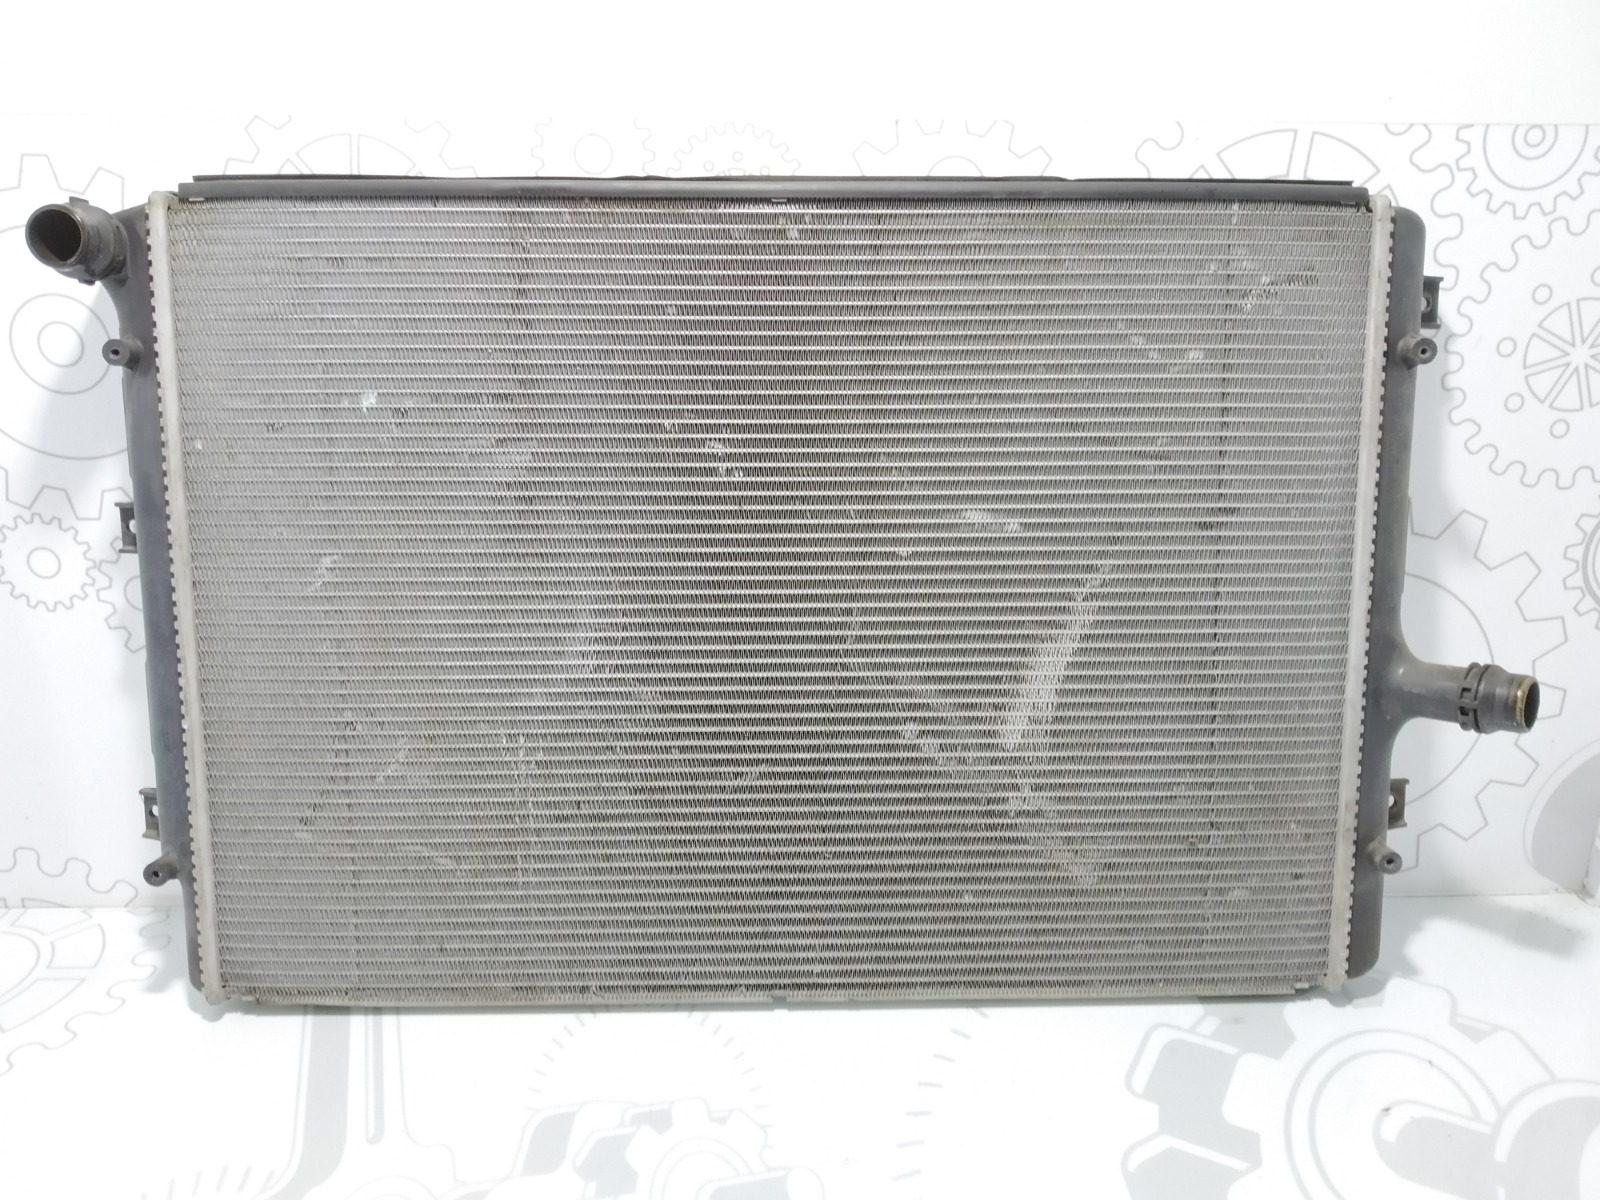 Радиатор (основной) Volkswagen Passat B6 2.0 TDI 2005 (б/у)